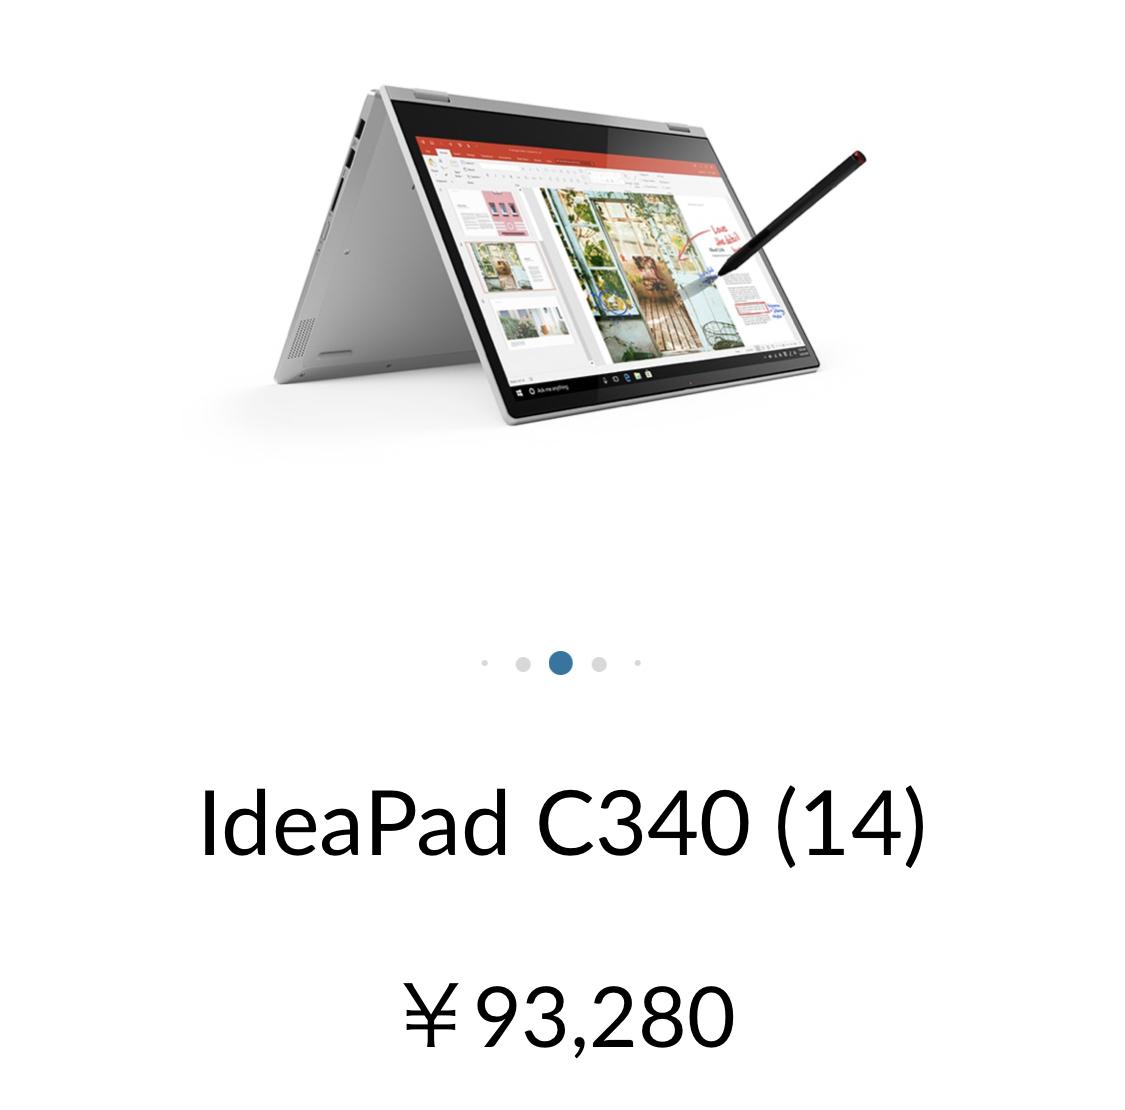 XCsjpV0 - 中国から買ったノートパソコン(55000円)届いたンゴ